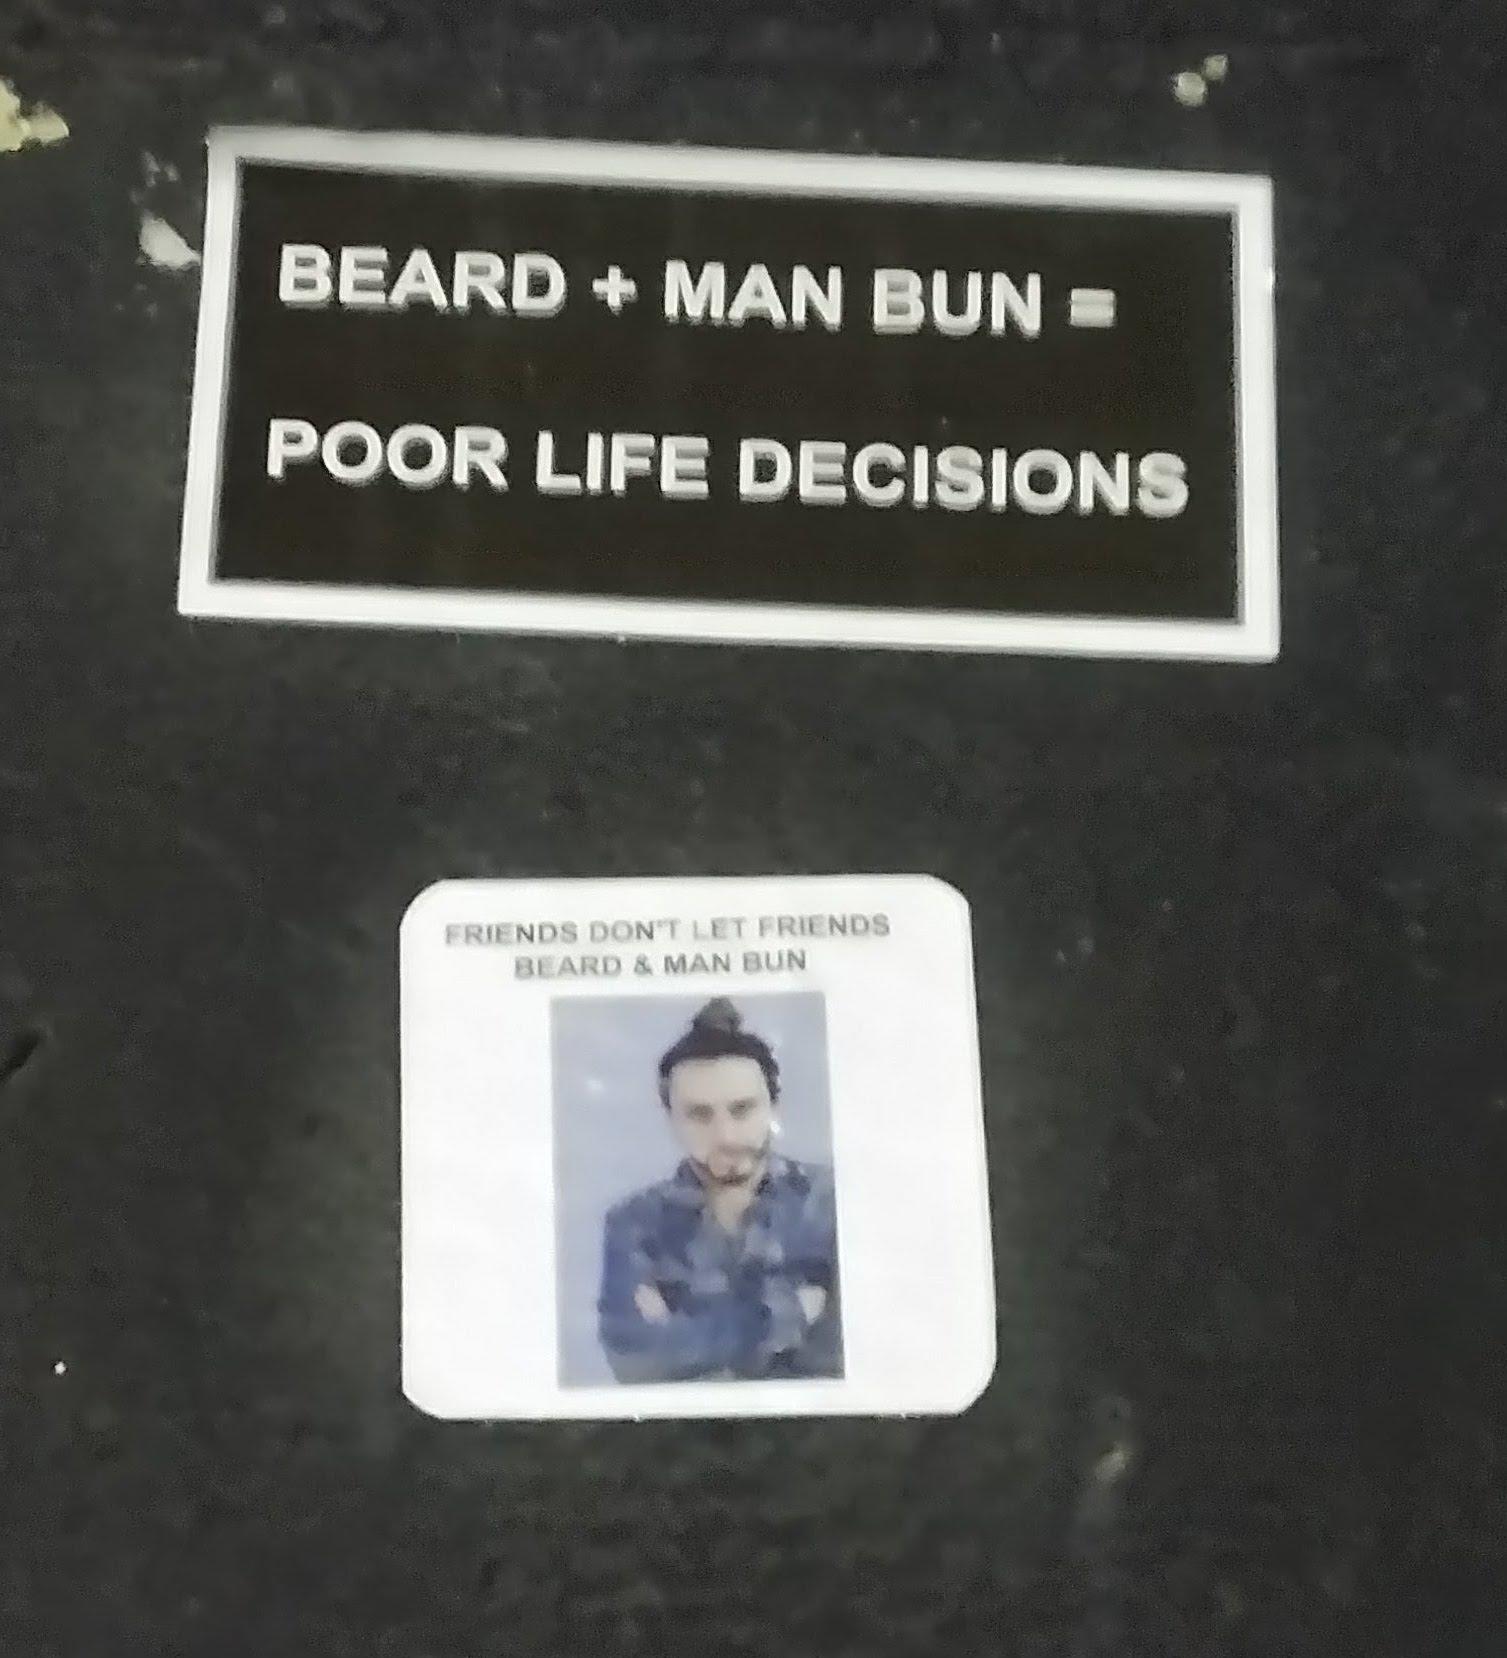 beard-plus-man-bun-equals-poor-life-decisions.jpg